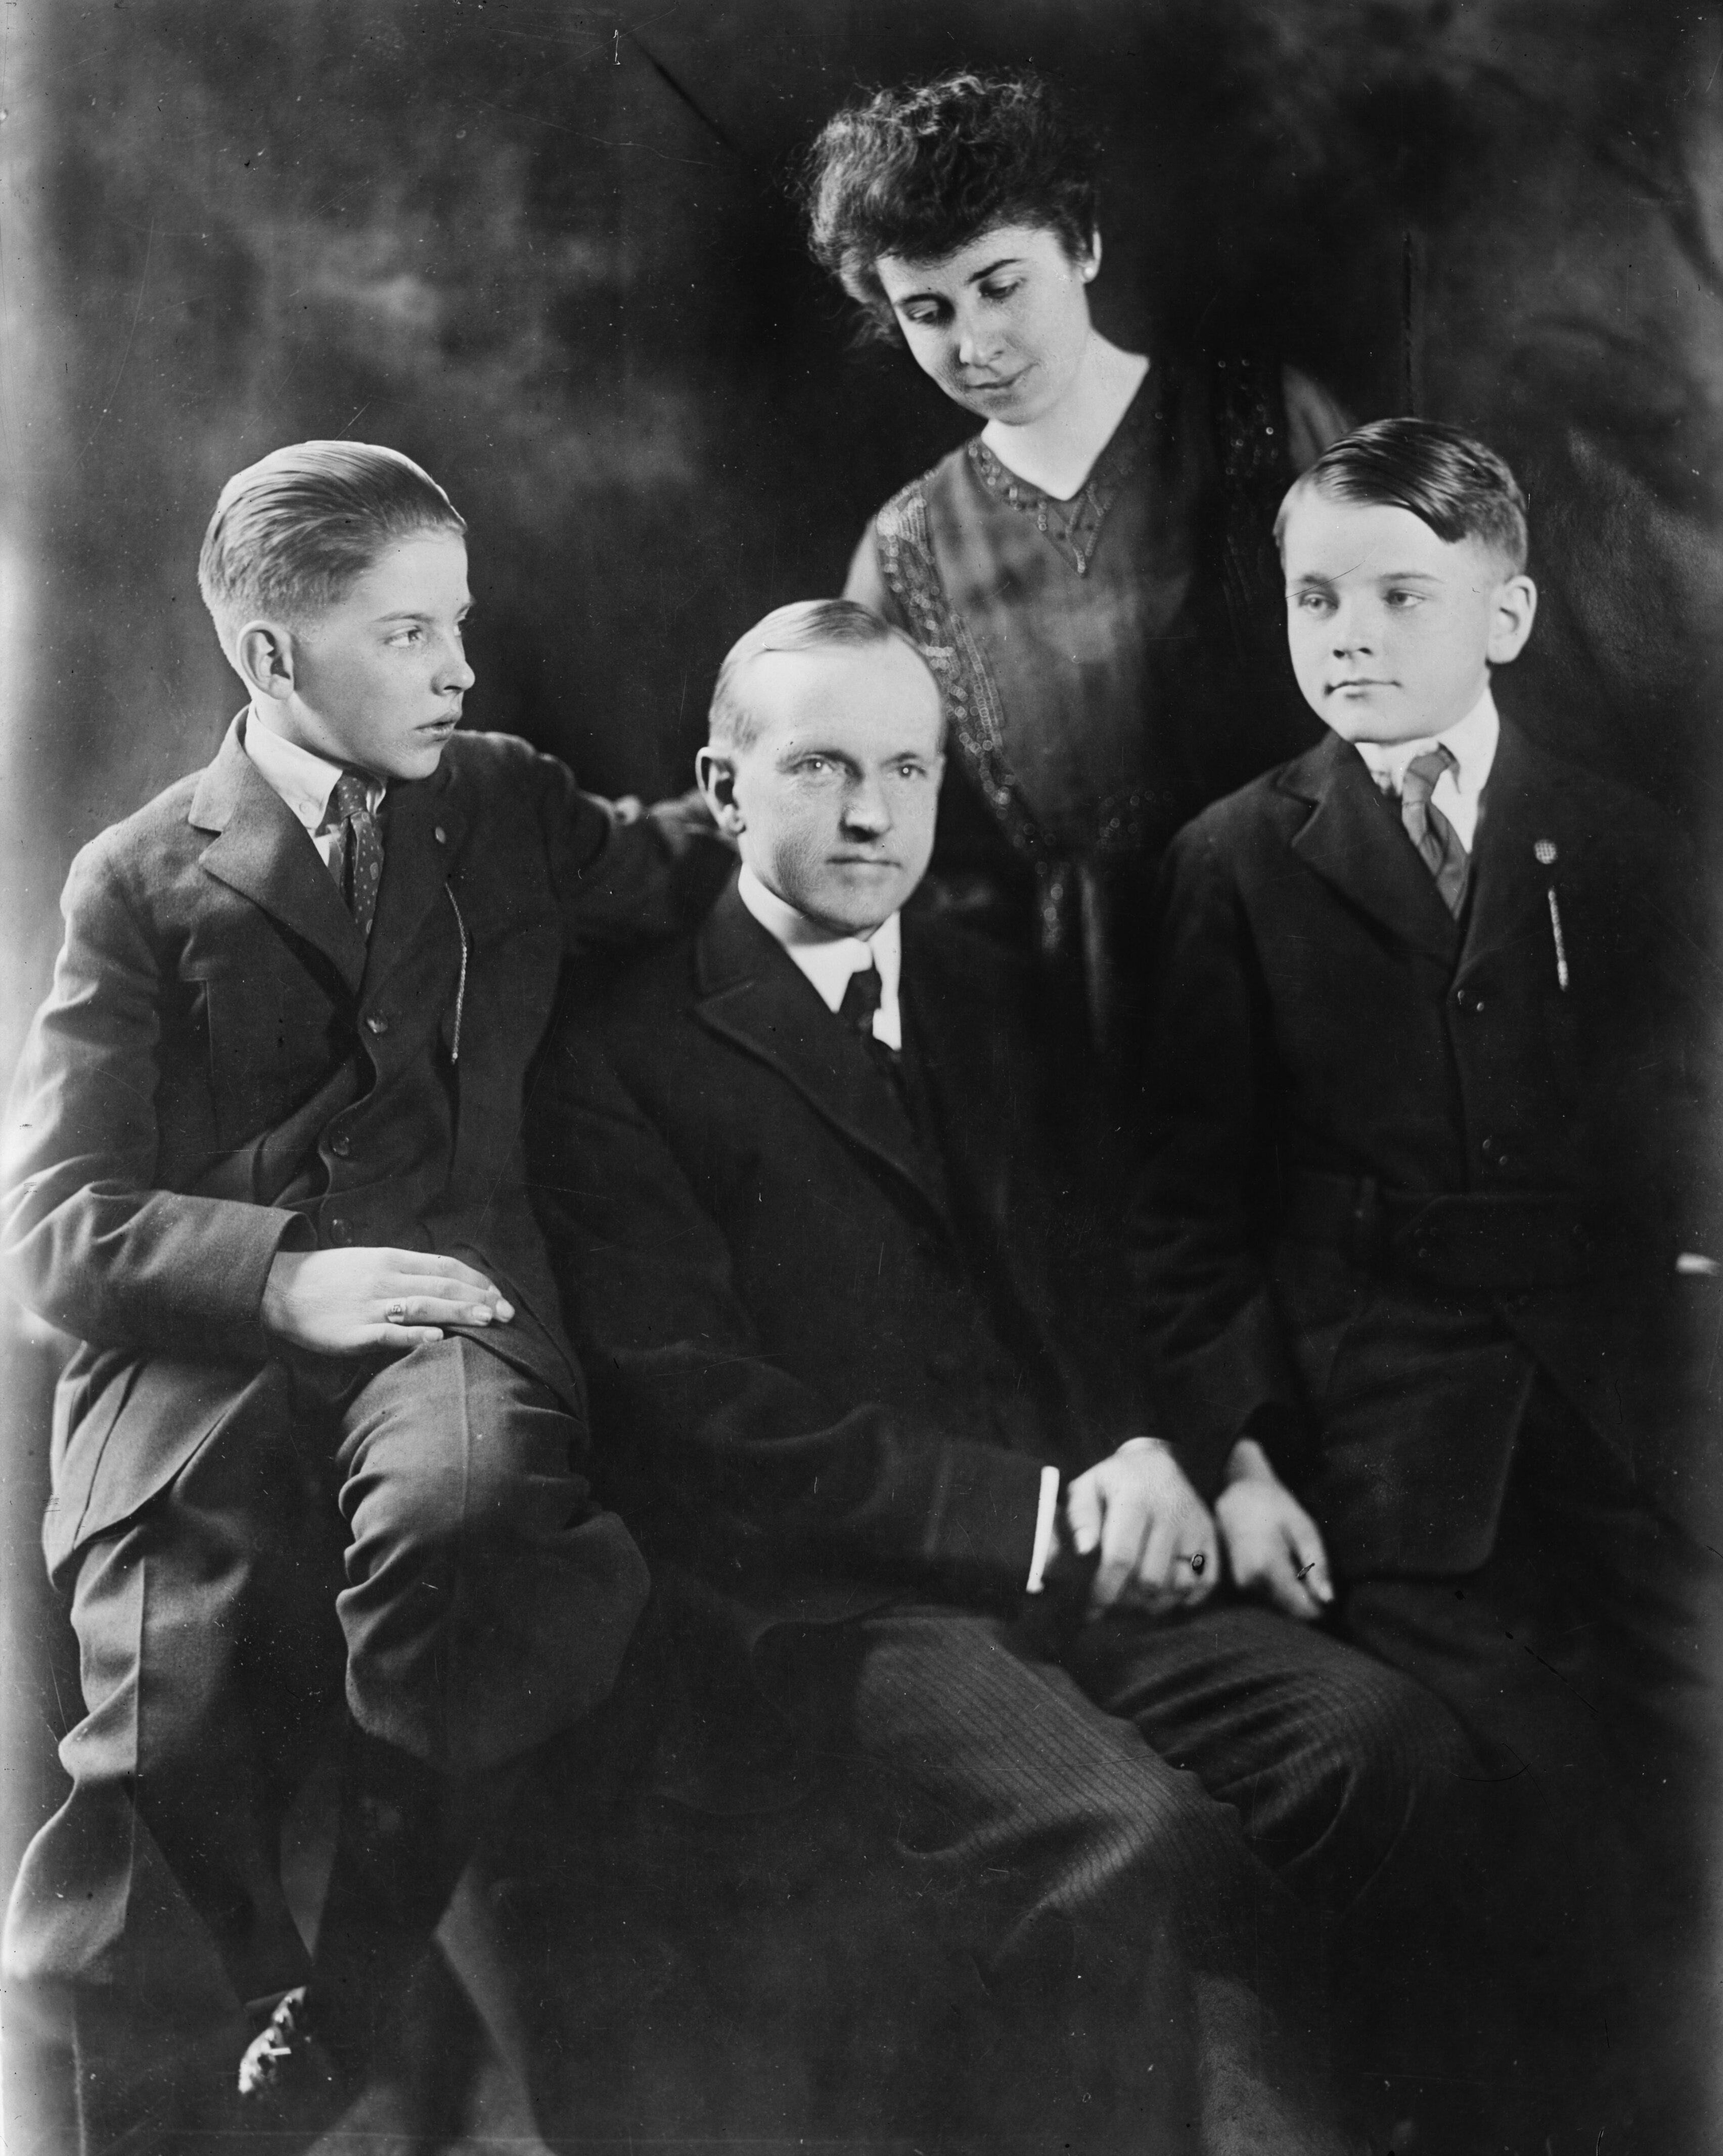 https://upload.wikimedia.org/wikipedia/commons/b/b7/Coolidge_family_LCCN2014716433.jpg